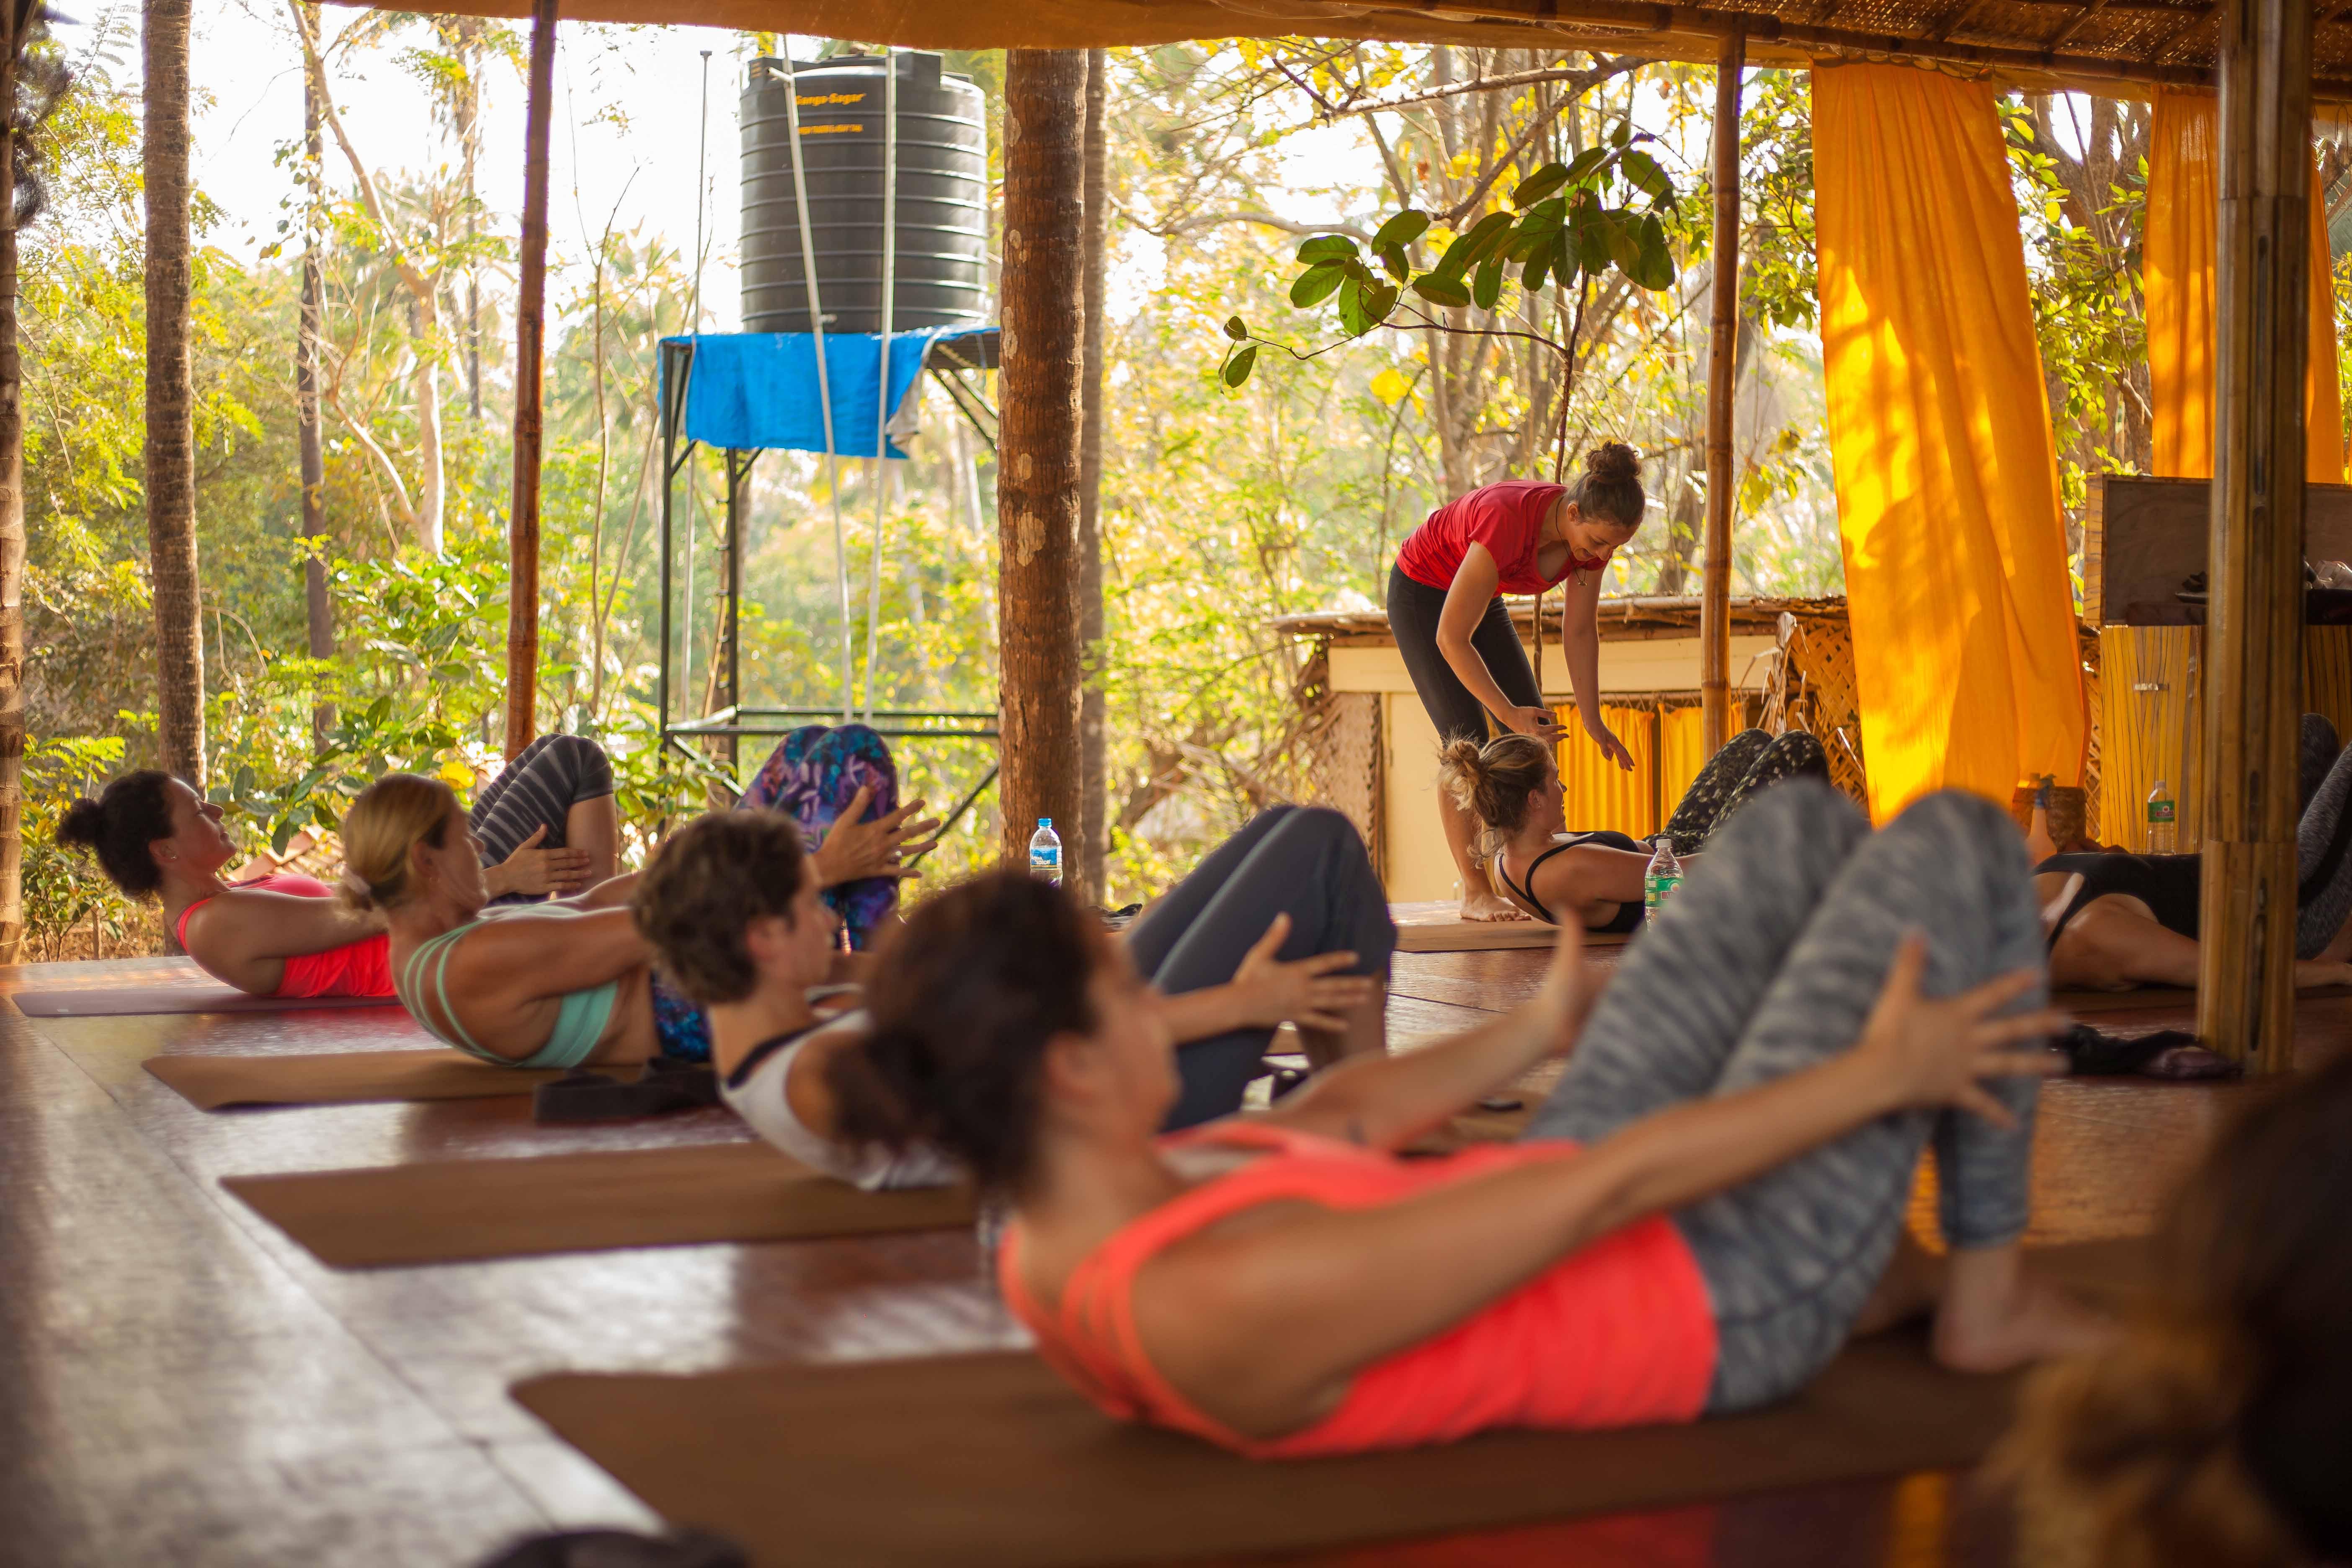 Orsi Plutzer Yoga Core work